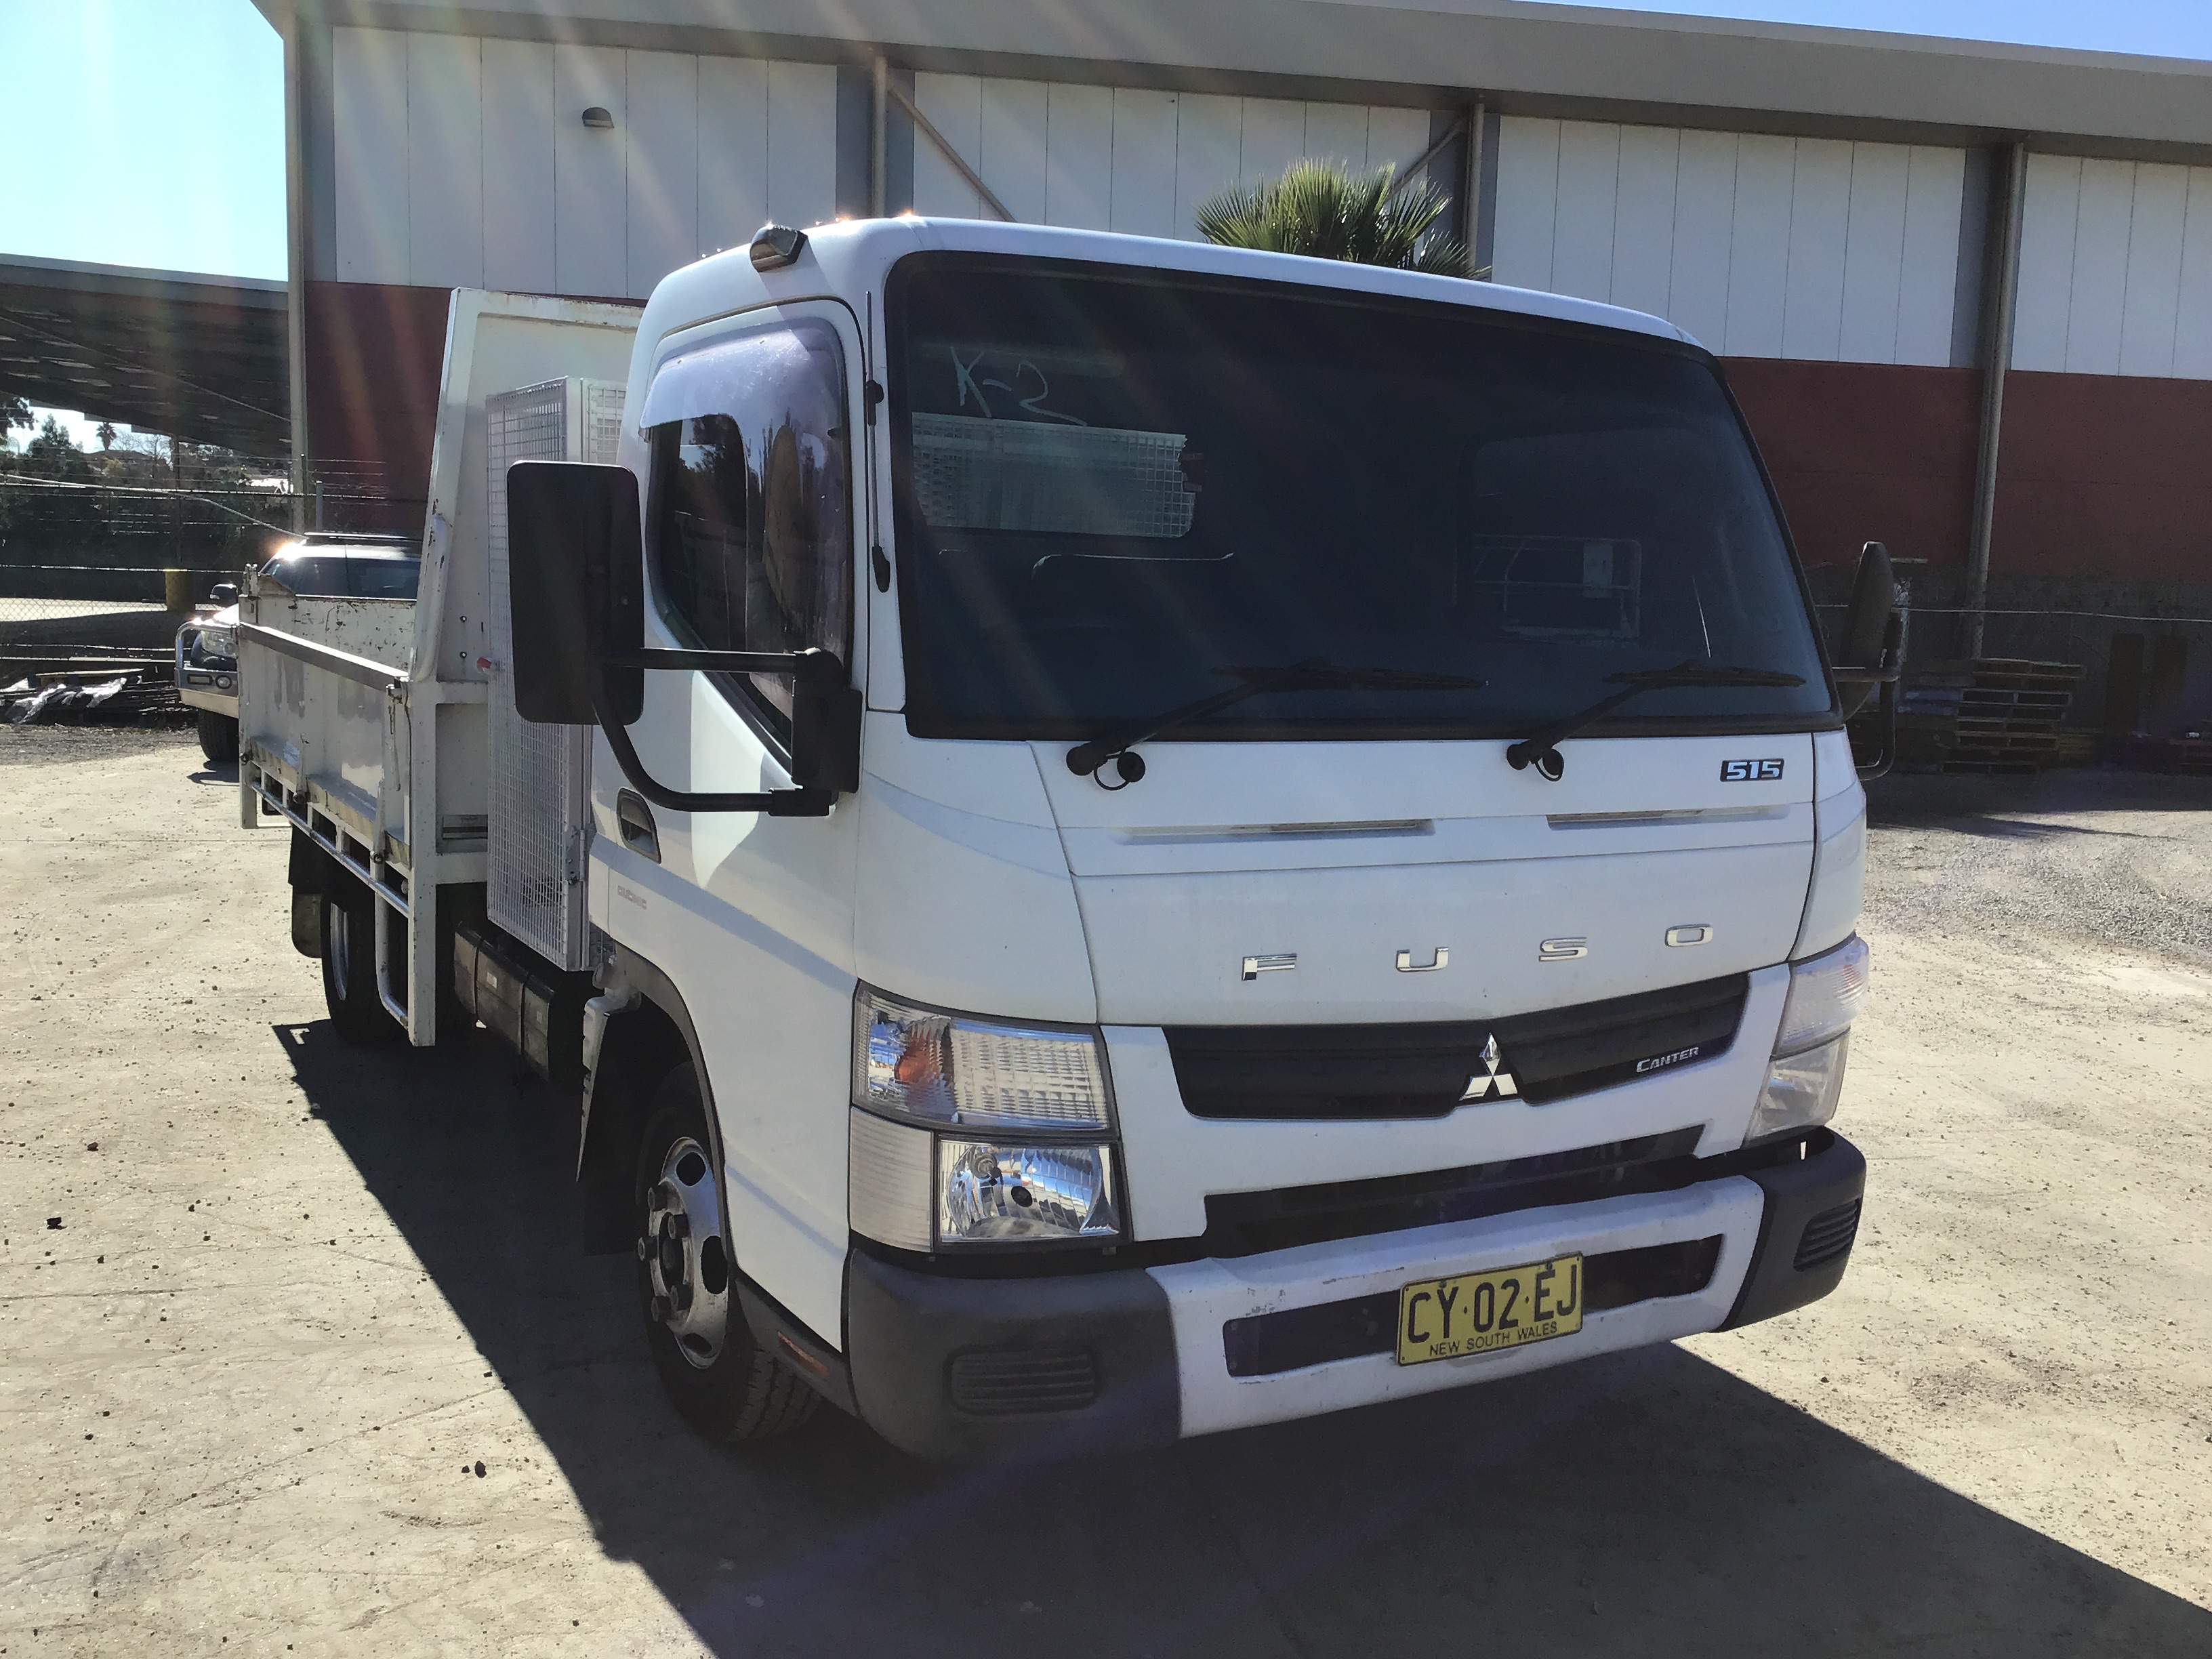 2013 Mitsubishi Fuso Canter 515 4 x 2 Tipper Truck